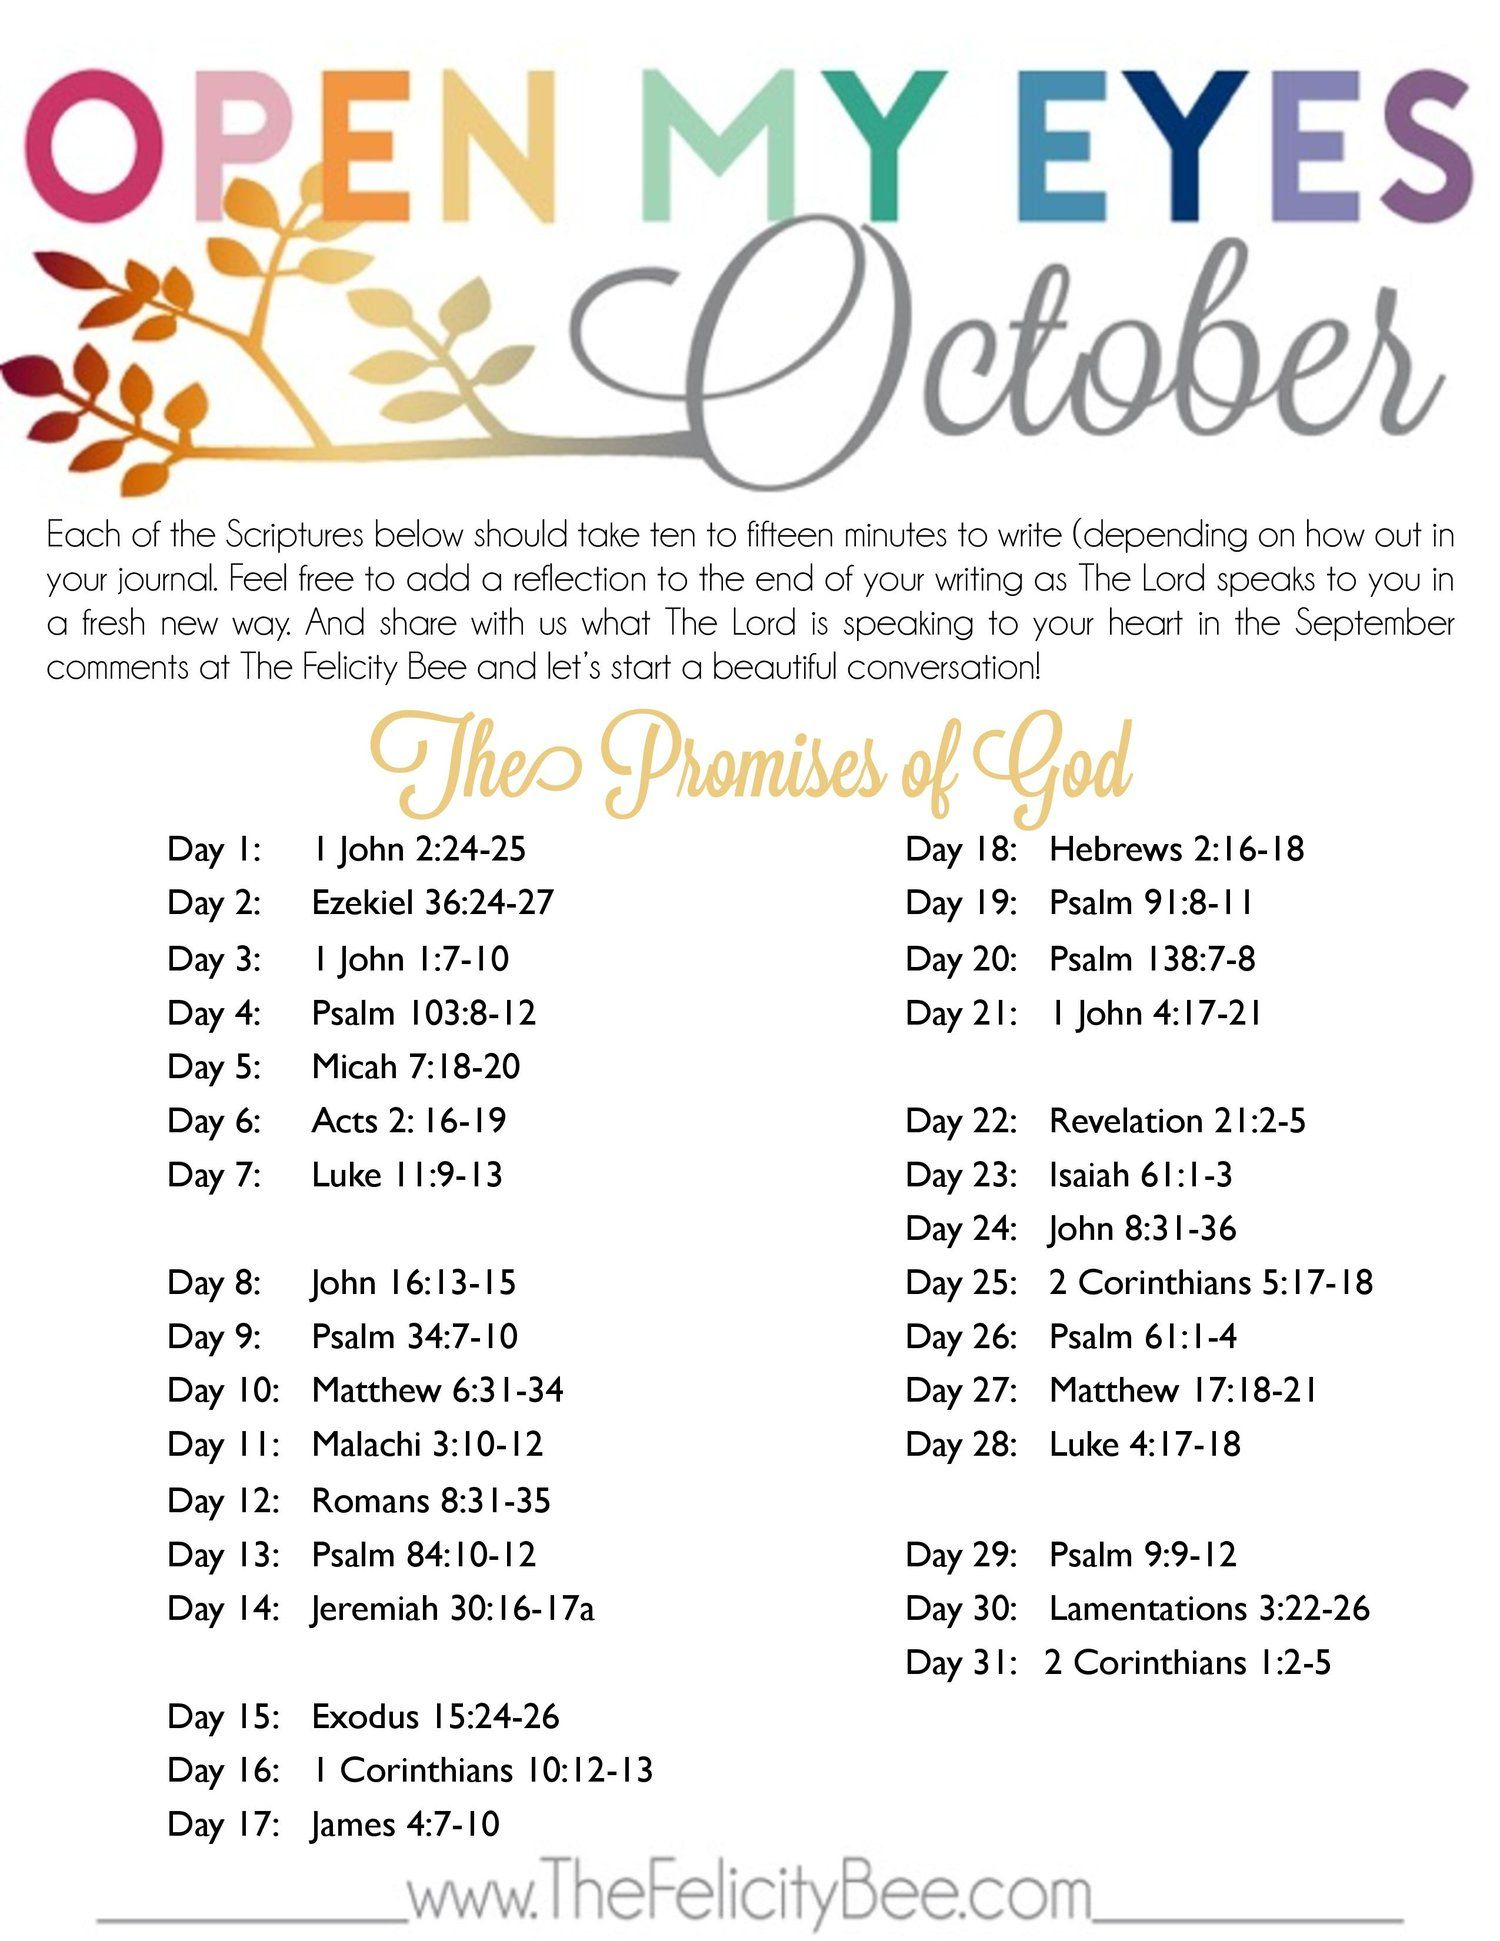 Open My Eyes October Scripture Writing Plan | grace